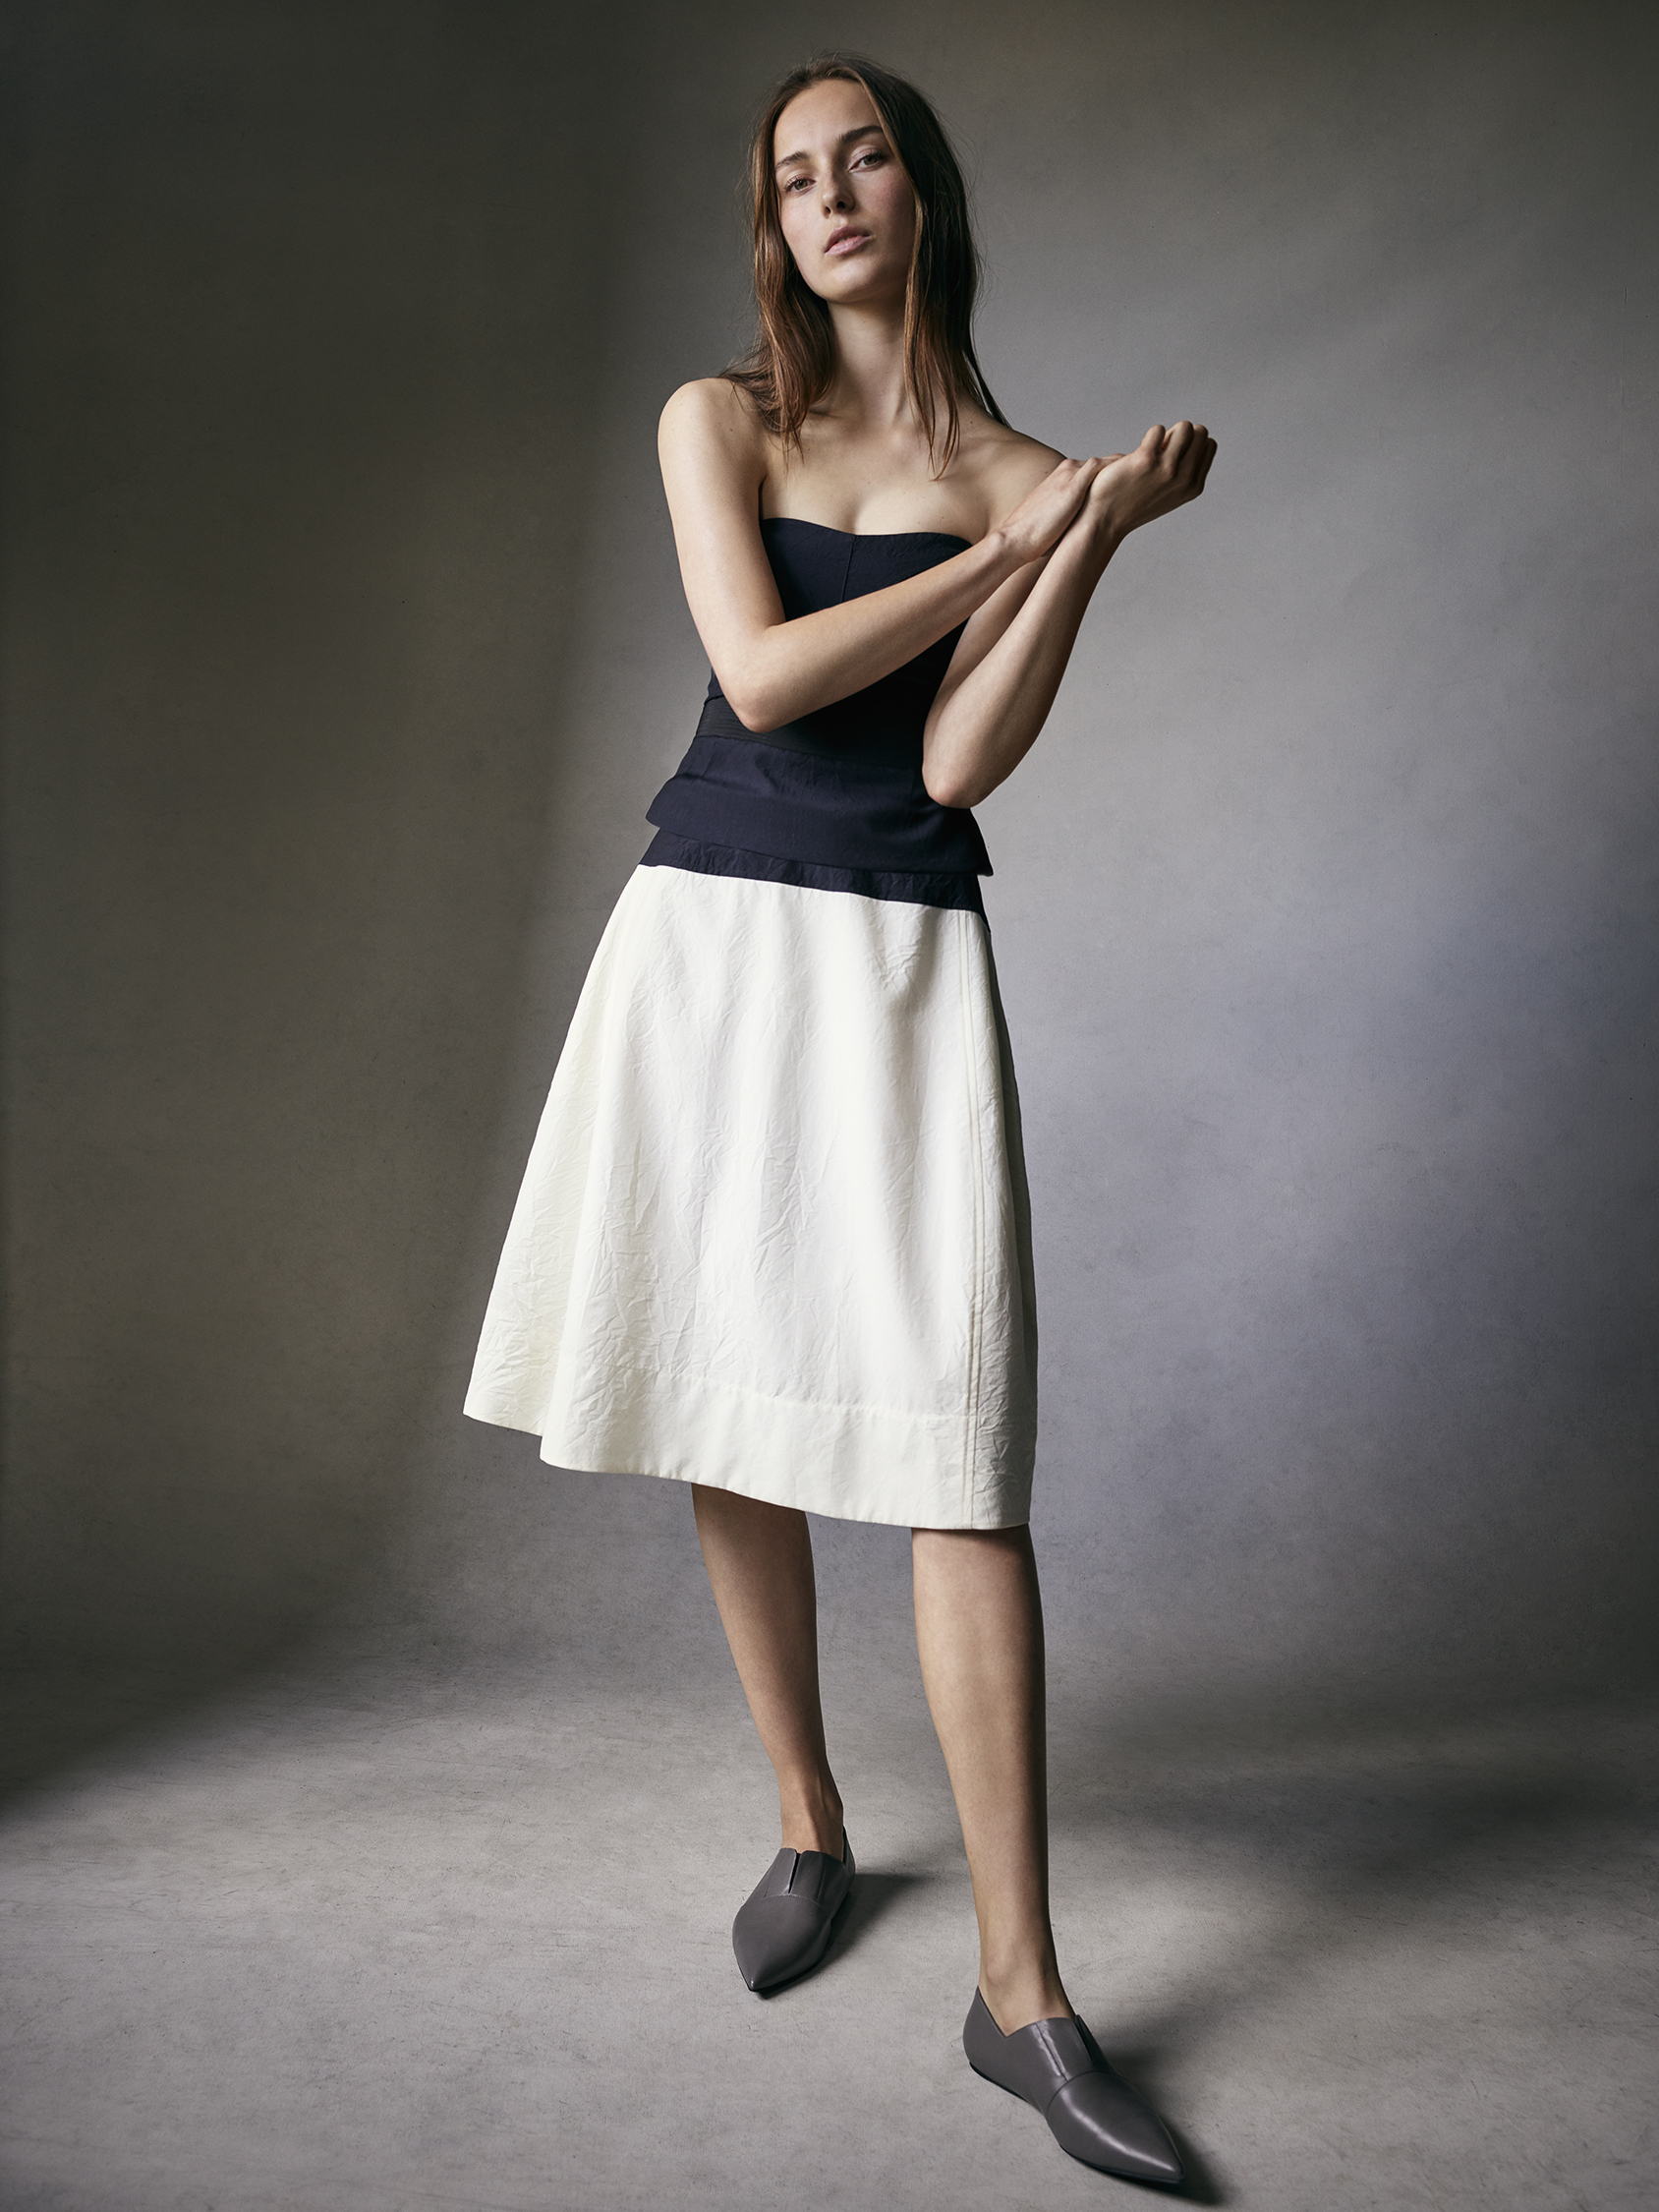 Look 10 Black wool-linen strapless top with white wool-linen full skirt.